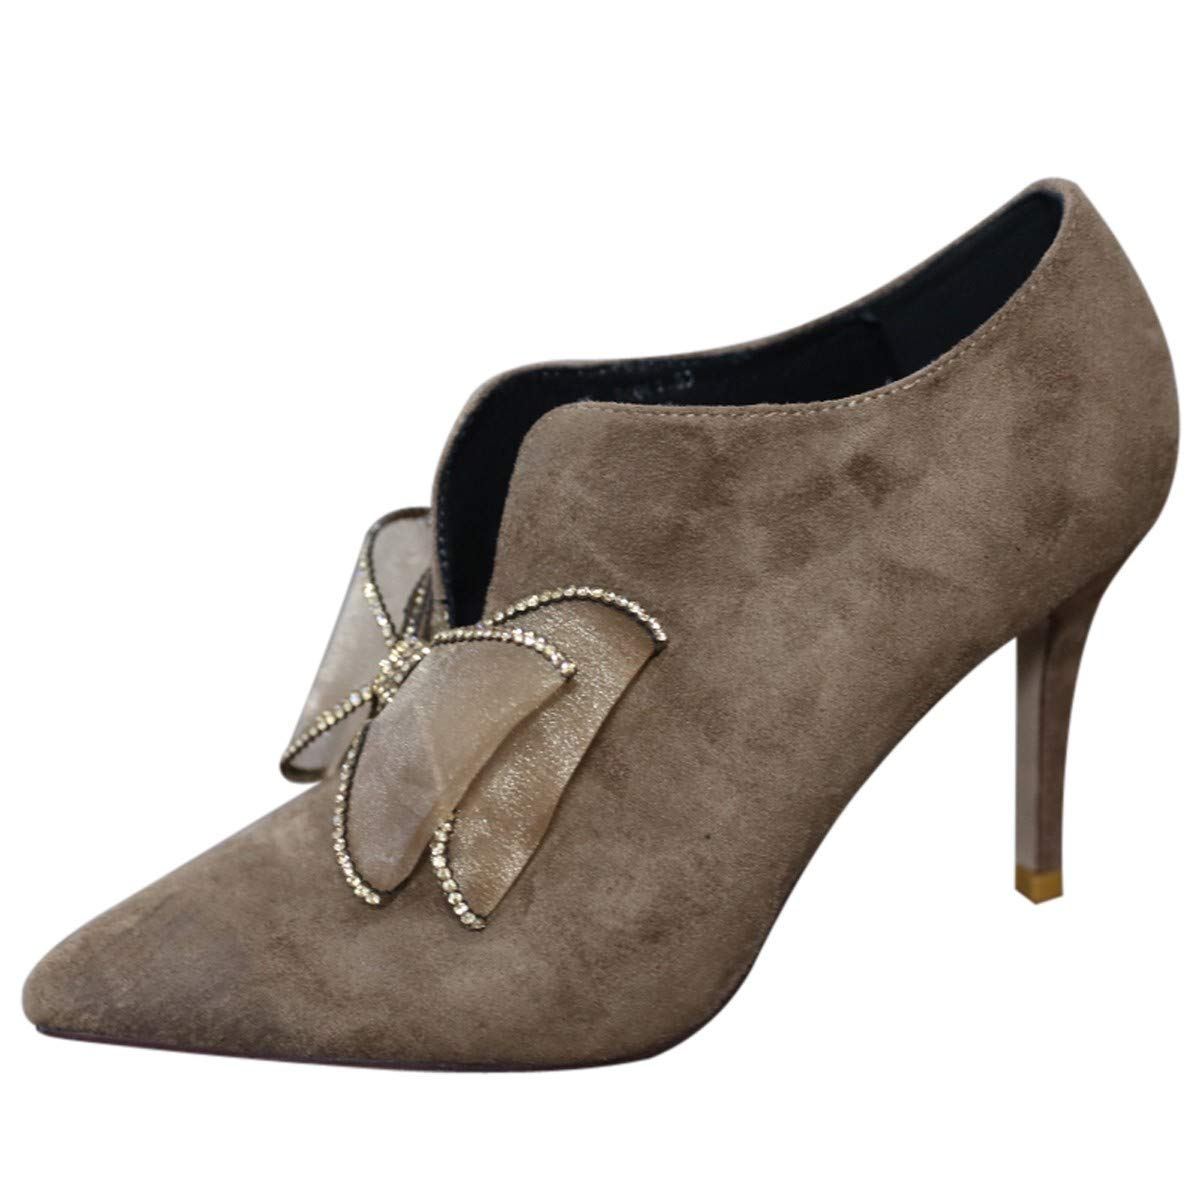 LBTSQ-Spitz Nackt Stiefel Fliege 8Cm Dünne Dünne Dünne Sohle Hochhackigen Schuhe Kurze Stiefel Wildleder Einzelne Schuhe Mode-Joker. e1db35